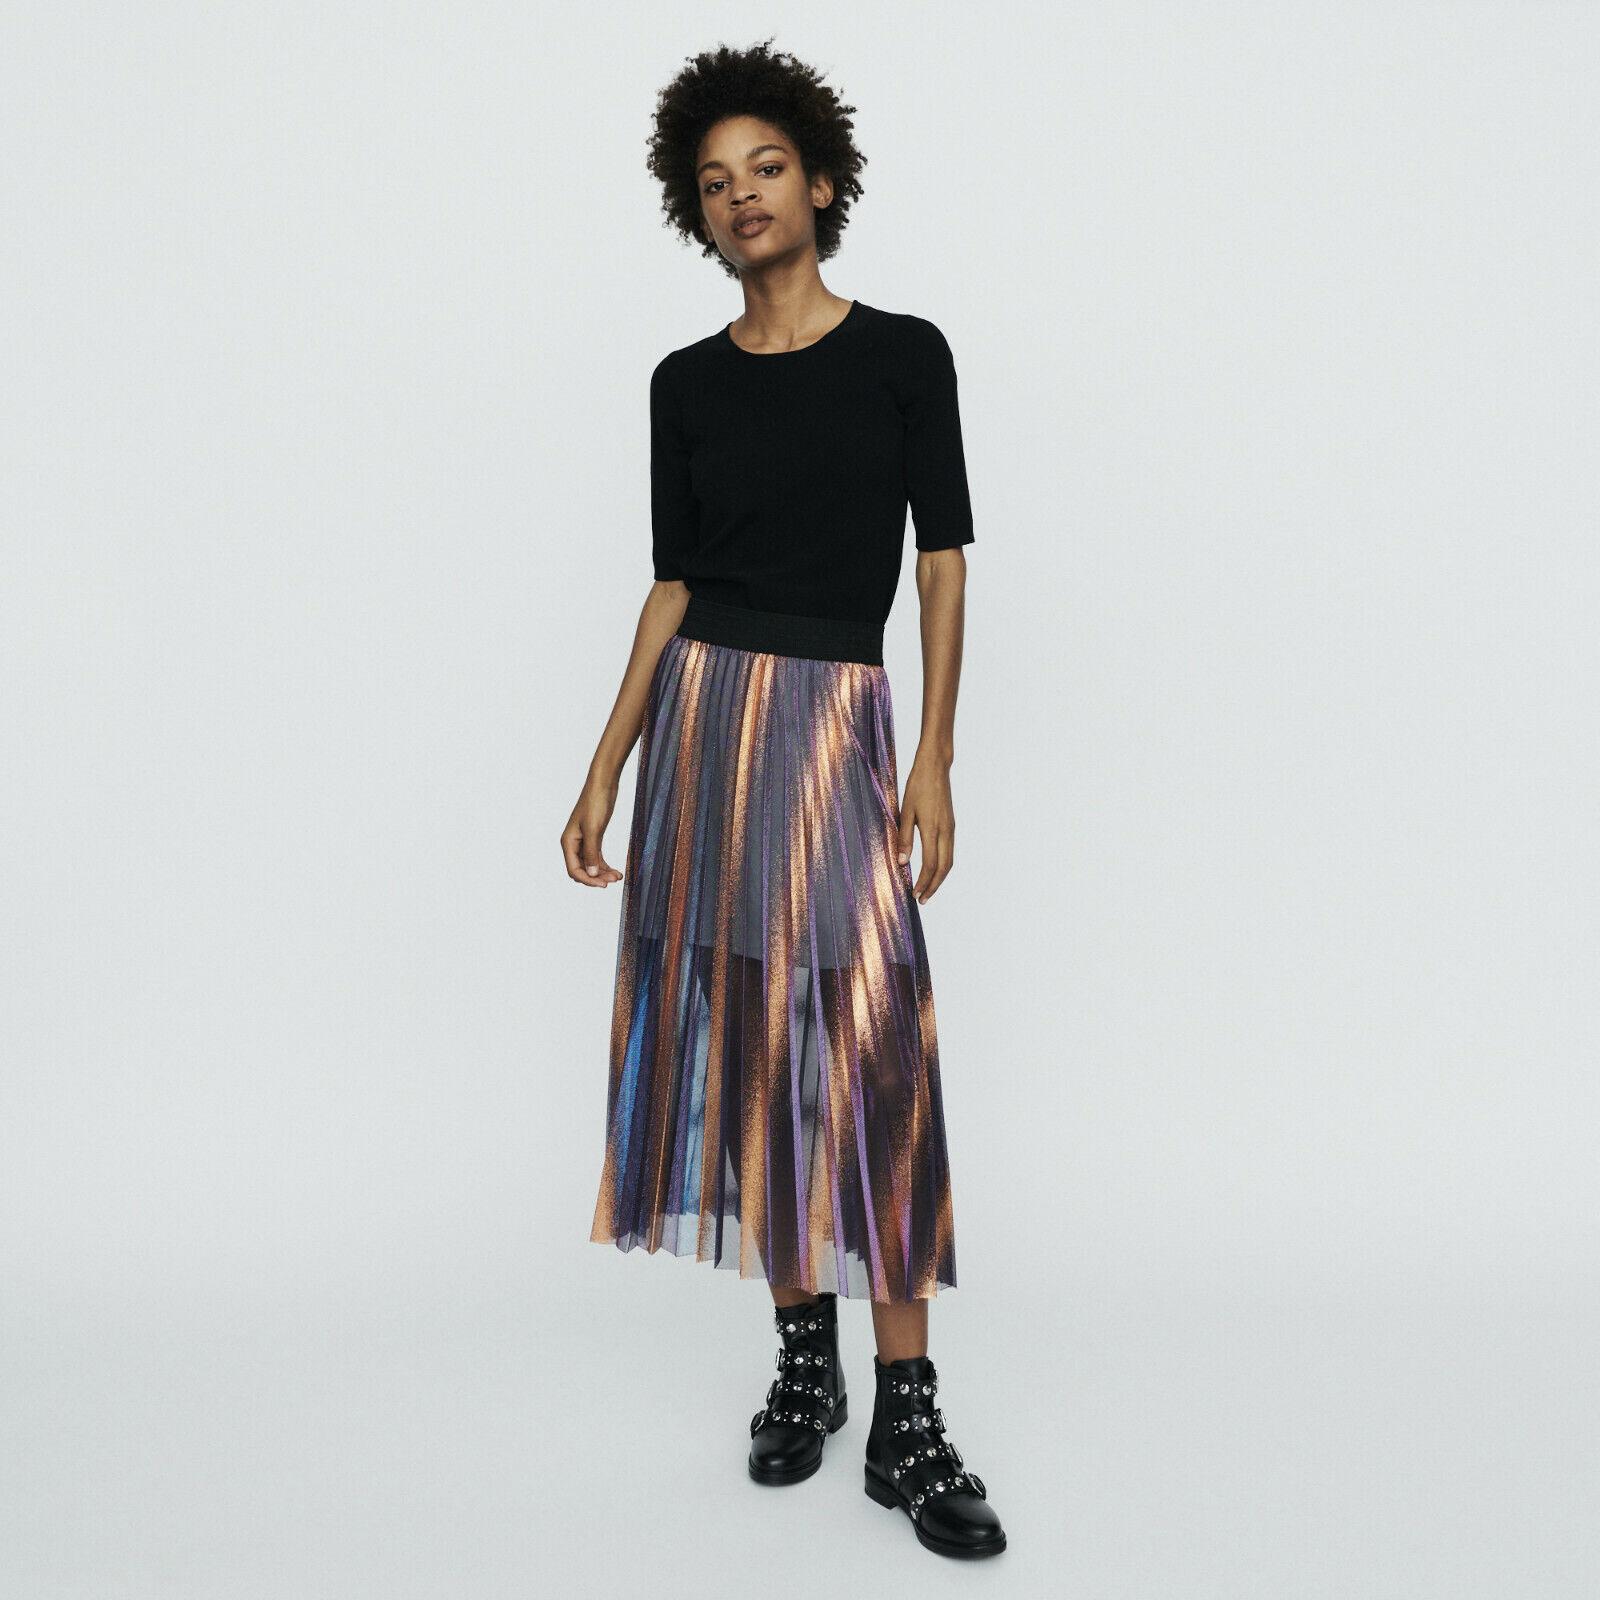 MAJE JAJA Pleated And Iridescent Long Skirt Size M Orig.  NWT